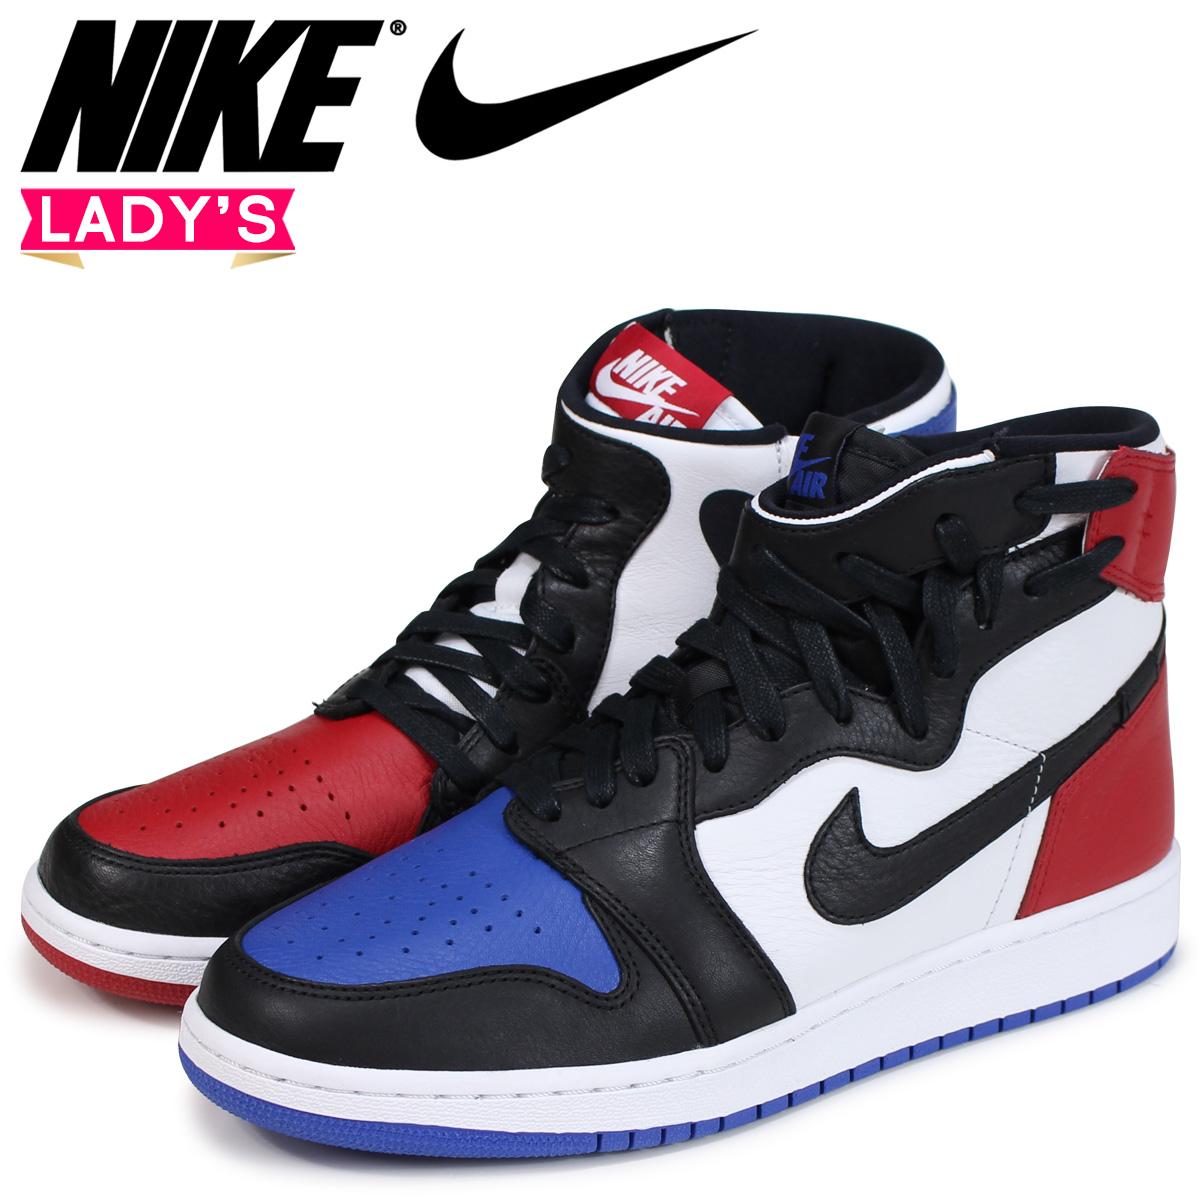 b52b4990992e91 NIKE Nike Air Jordan 1 nostalgic sneakers Lady s WMNS AIR JORDAN 1 REBEL XX  OG AT4151-001 black  load planned Shinnyu load in reservation product 6 29  ...